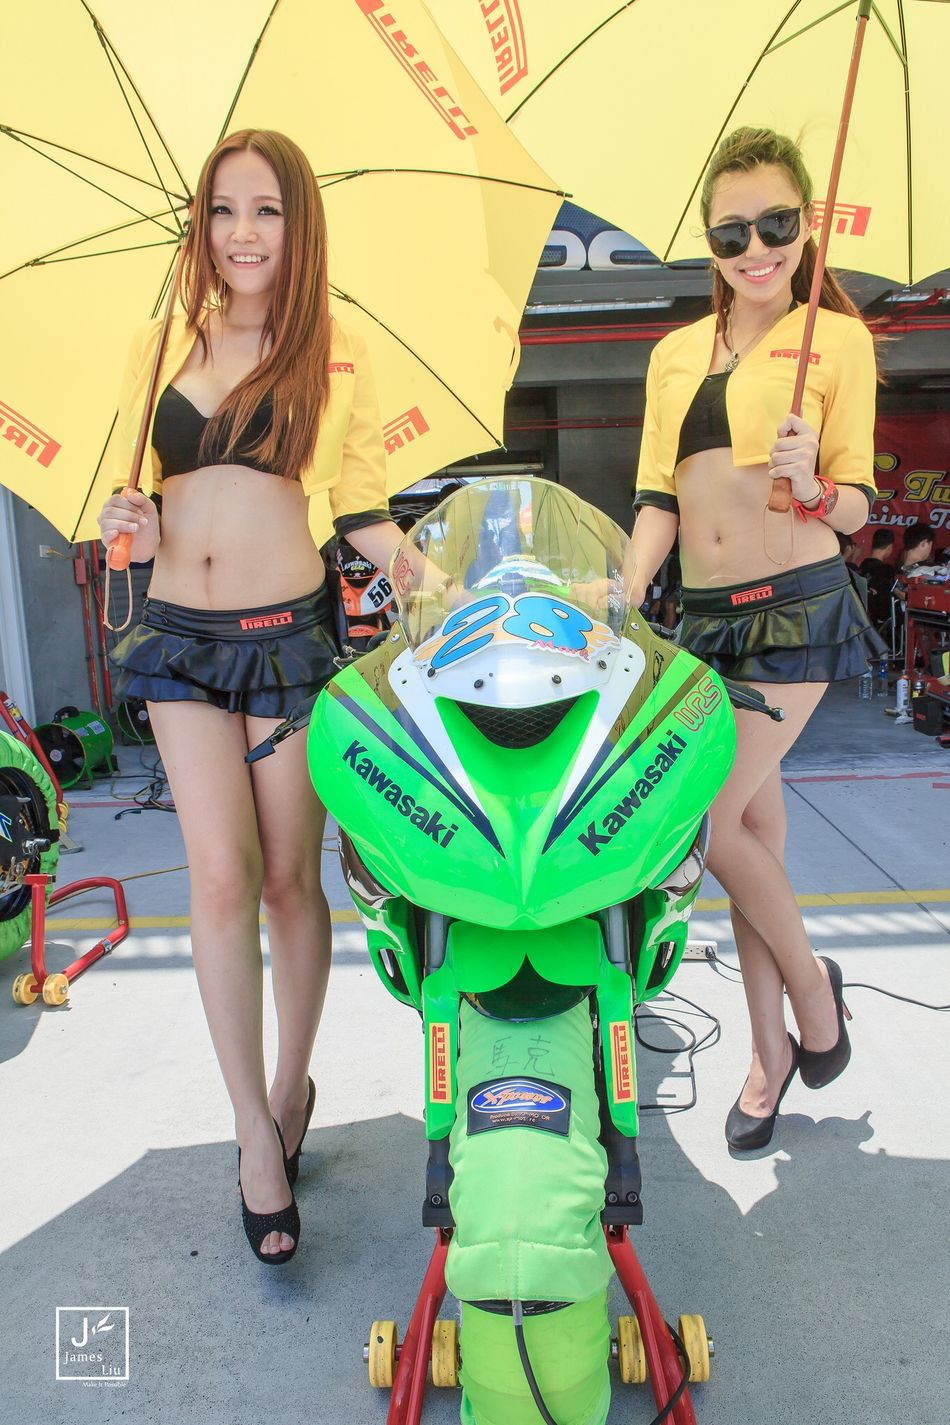 Taking Photo EyeEm Taiwan Motorcycles Beautiful Girl Juicy Girl Hot People Watching Photo Shoot Pirelli Racing